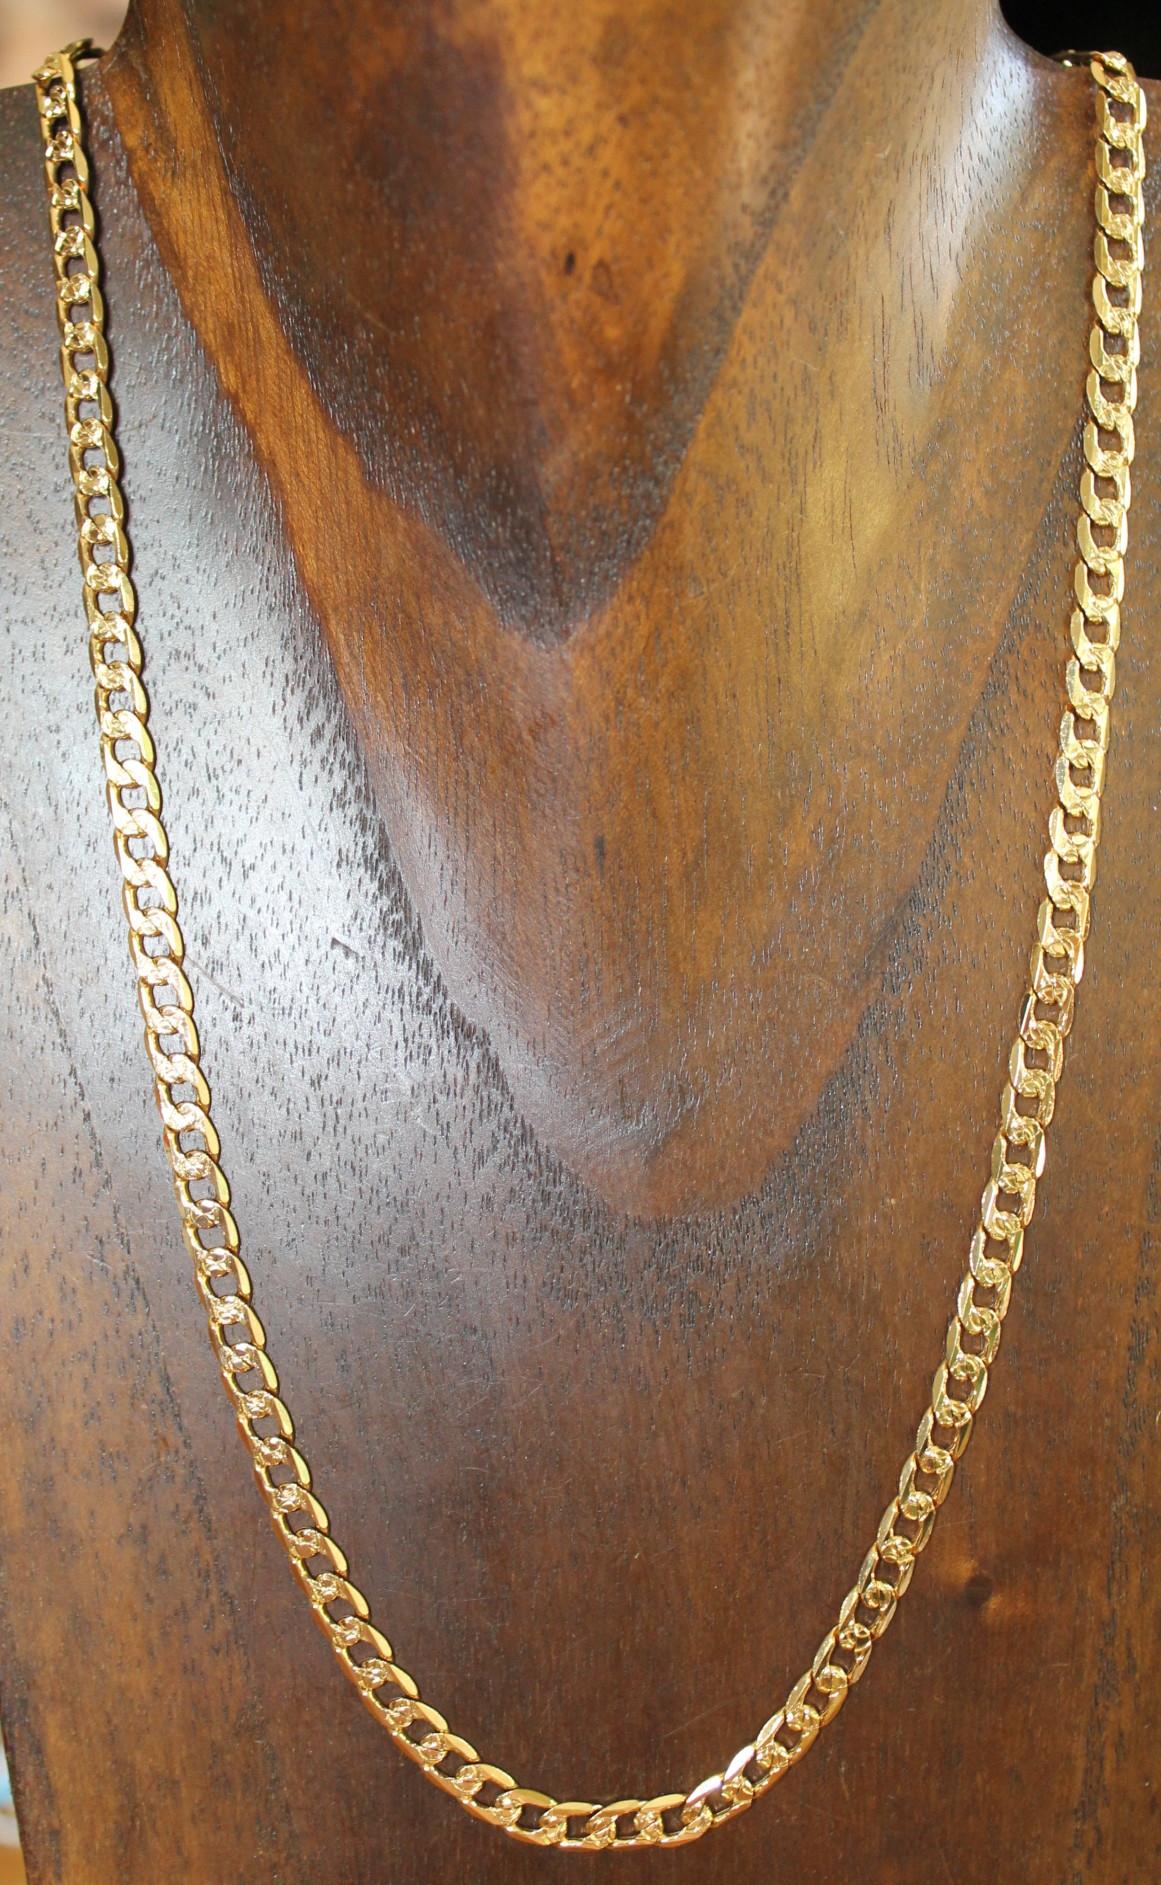 zapatos de separación f1774 819d6 Collar cadena de oro para hombre n996